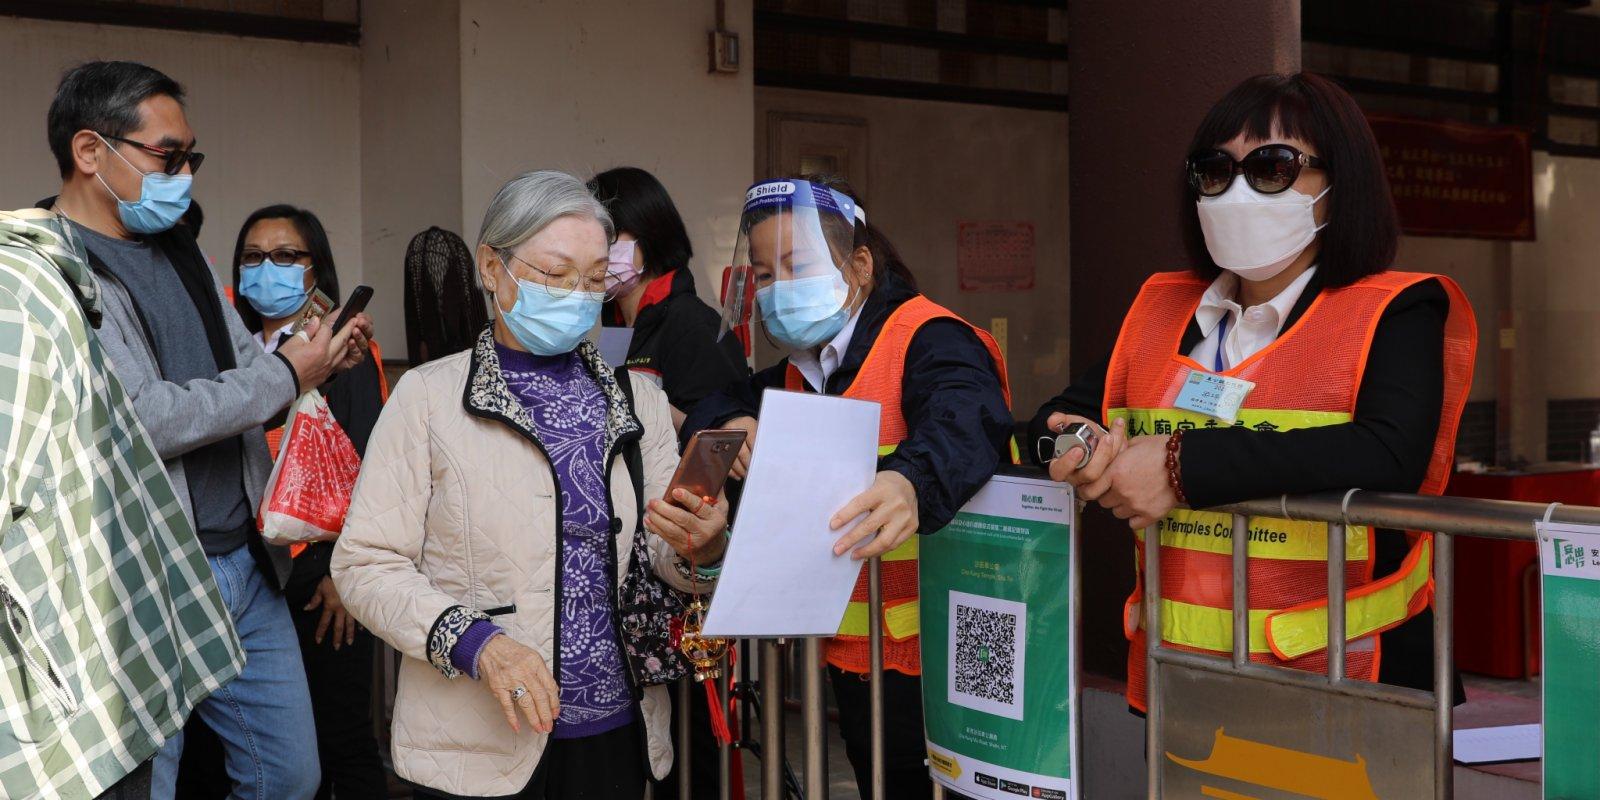 Coronavirus | HK logs 13 new COVID-19 cases, three untraceable